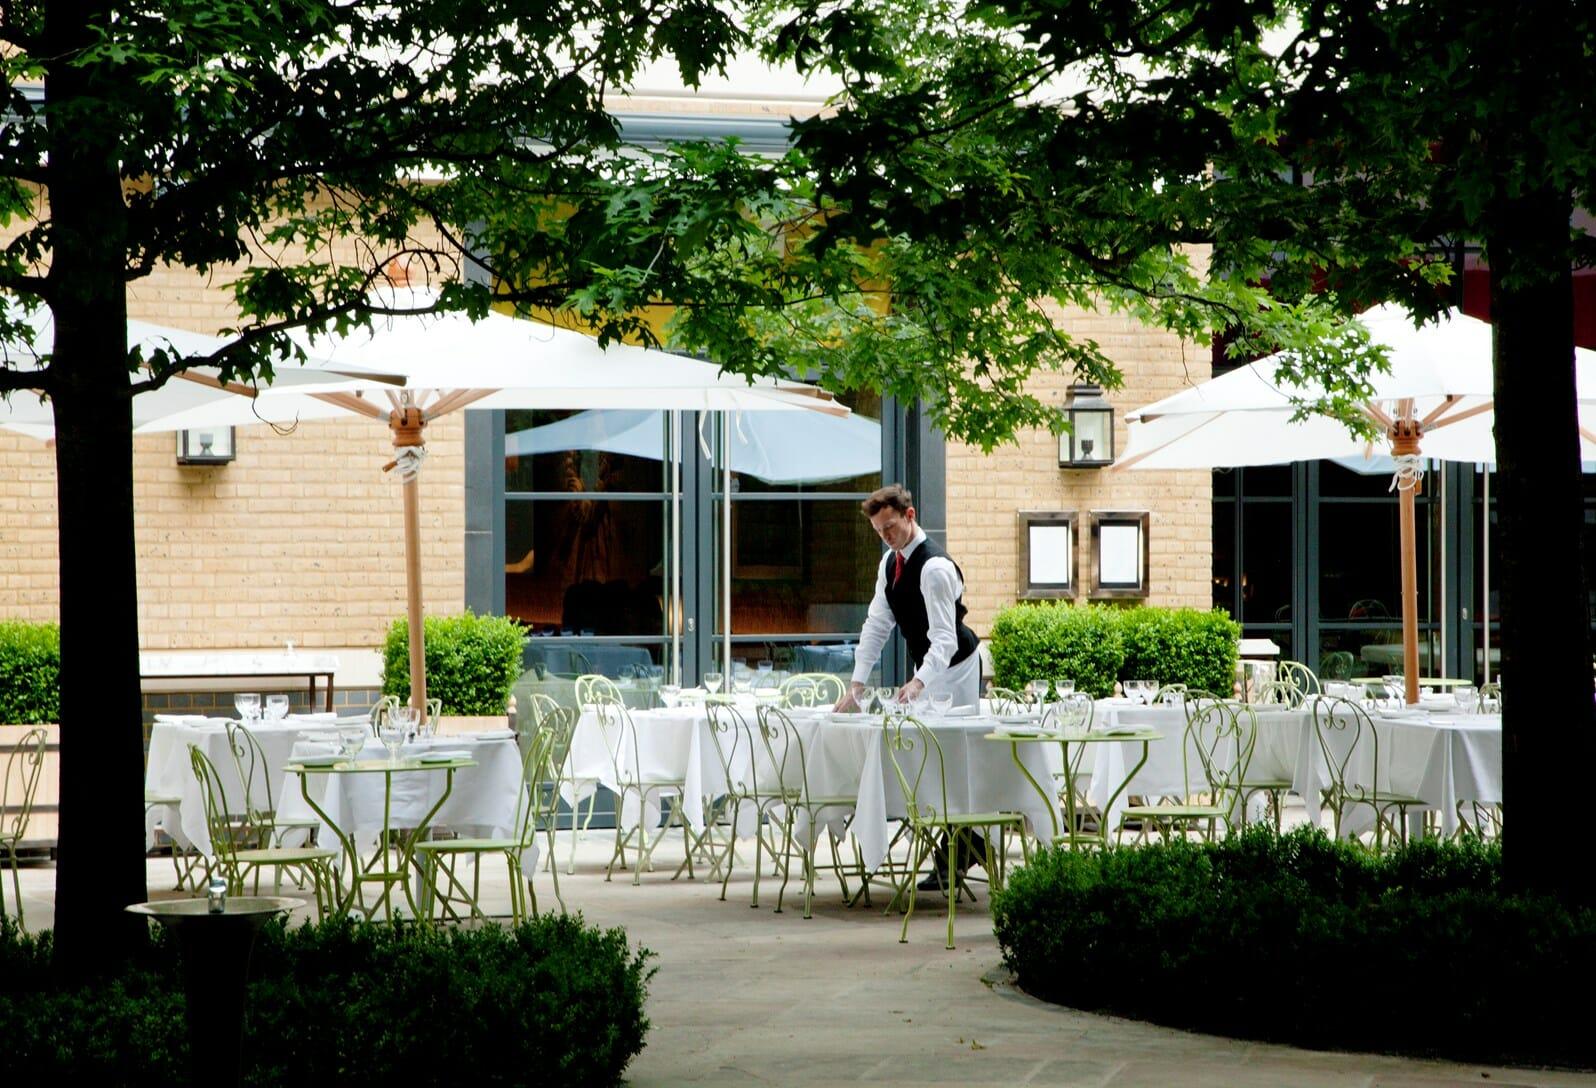 Ham Yard Hotel al fresco restaurant